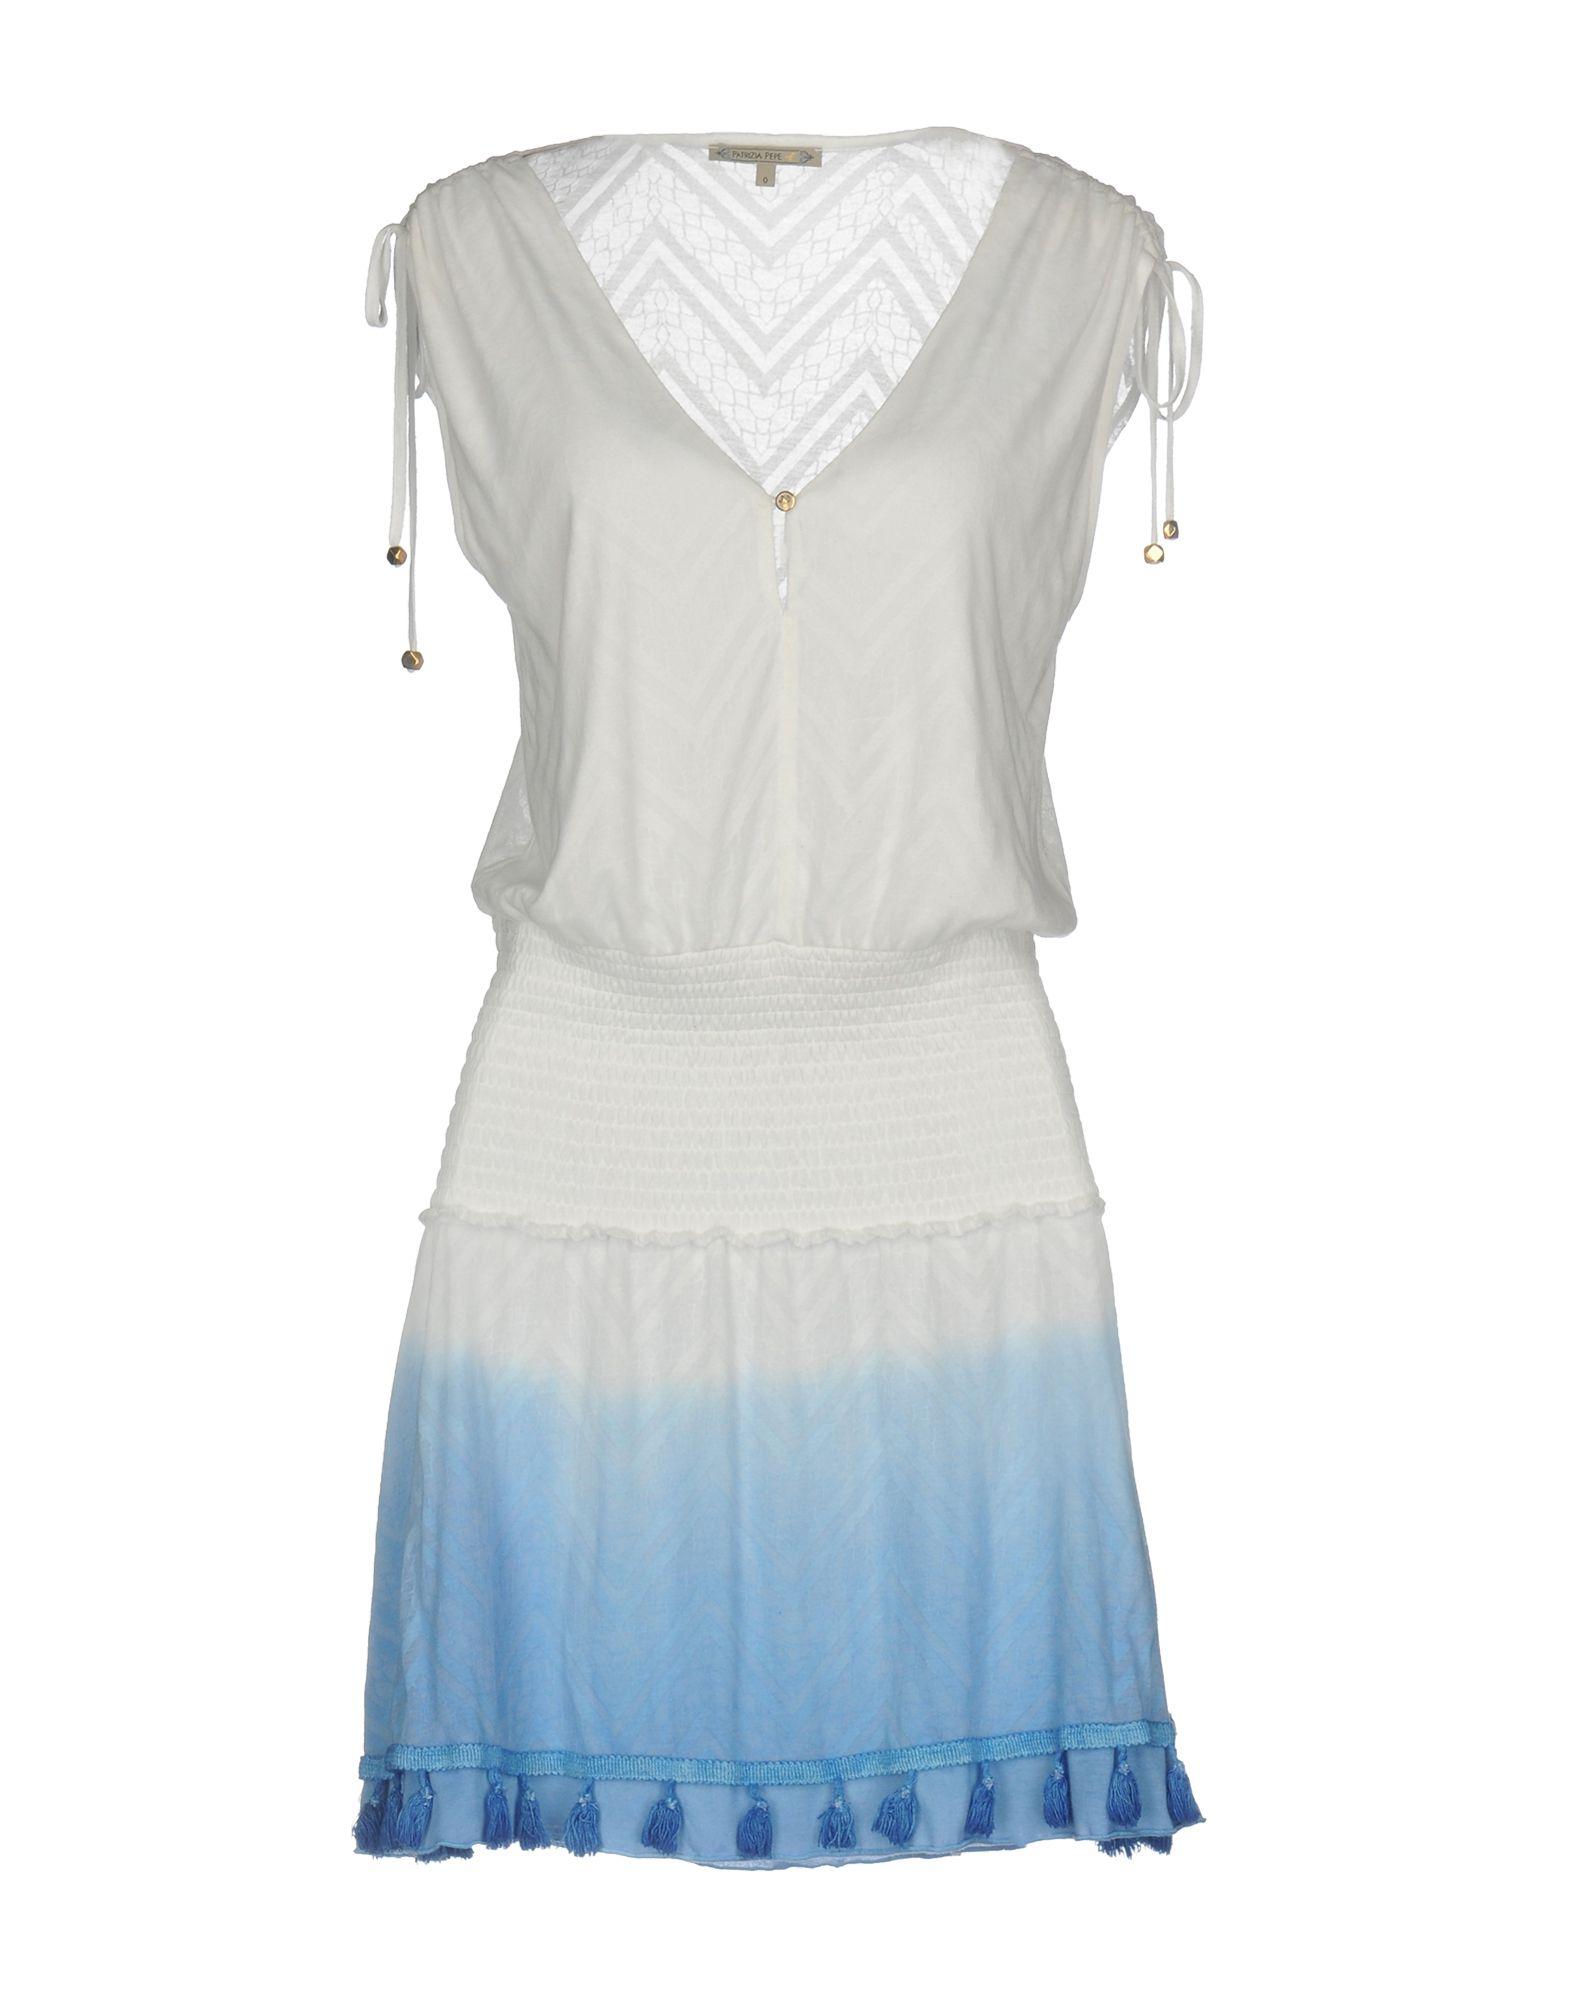 PATRIZIA PEPE Короткое платье patrizia pepe платье из ткани с креповым эффектом